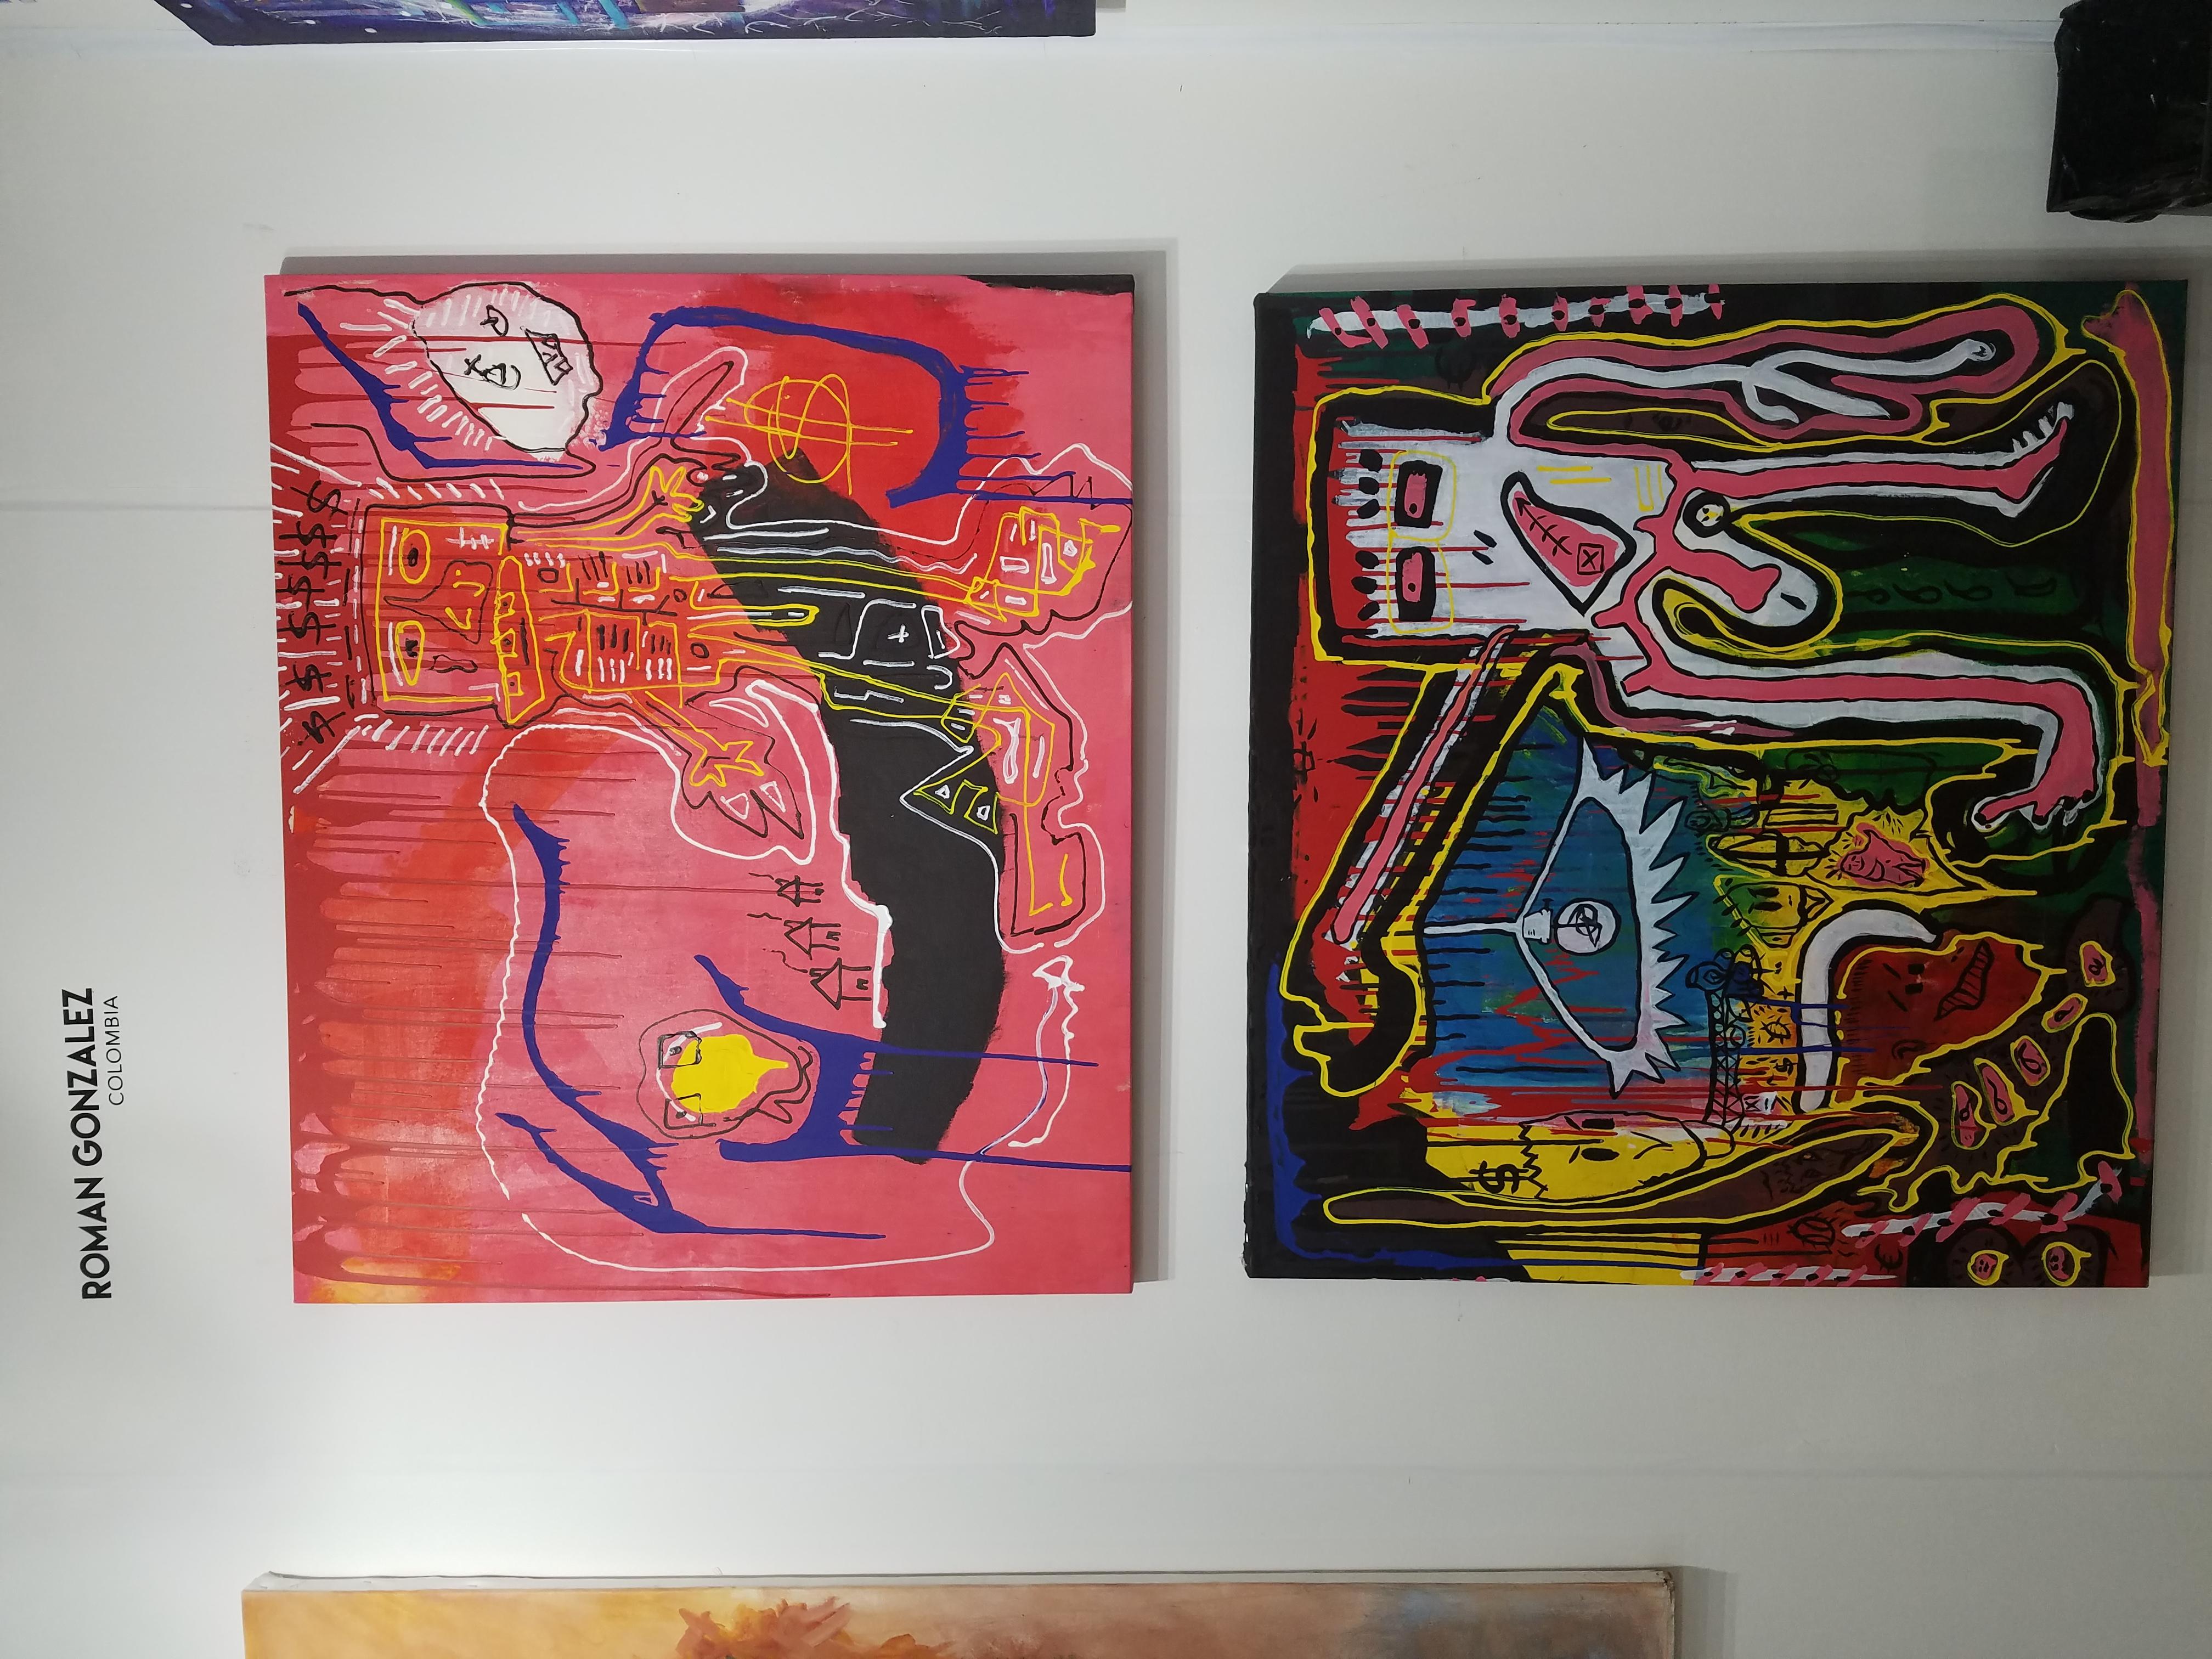 Roman Gonzalez's artwork